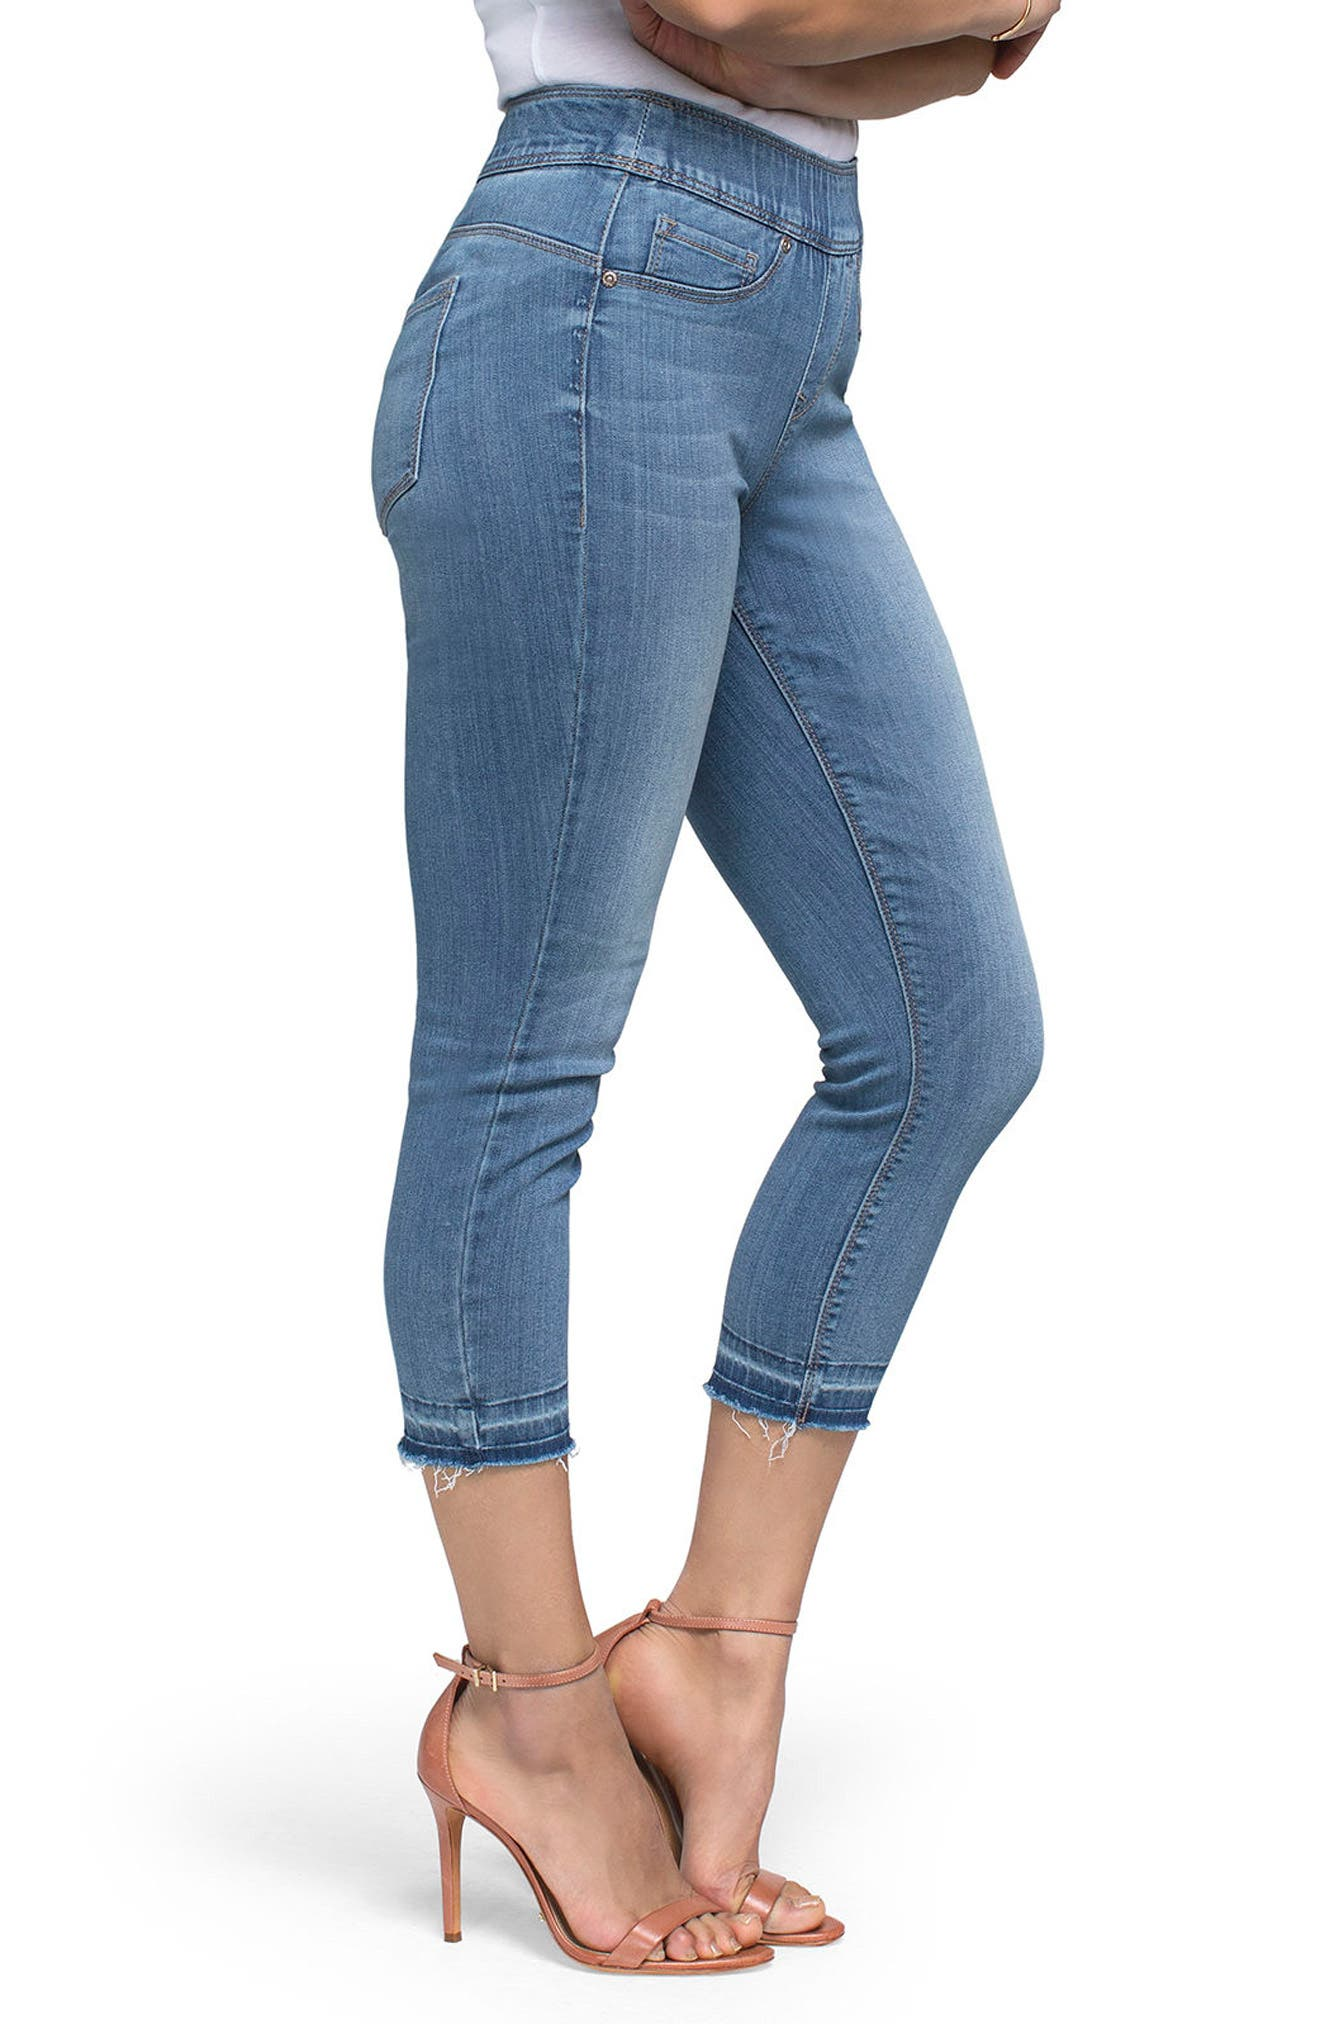 CURVES 360 BY NYDJ,                             NYDJ Release Hem Pull-On Crop Skinny Jeans,                             Alternate thumbnail 3, color,                             406